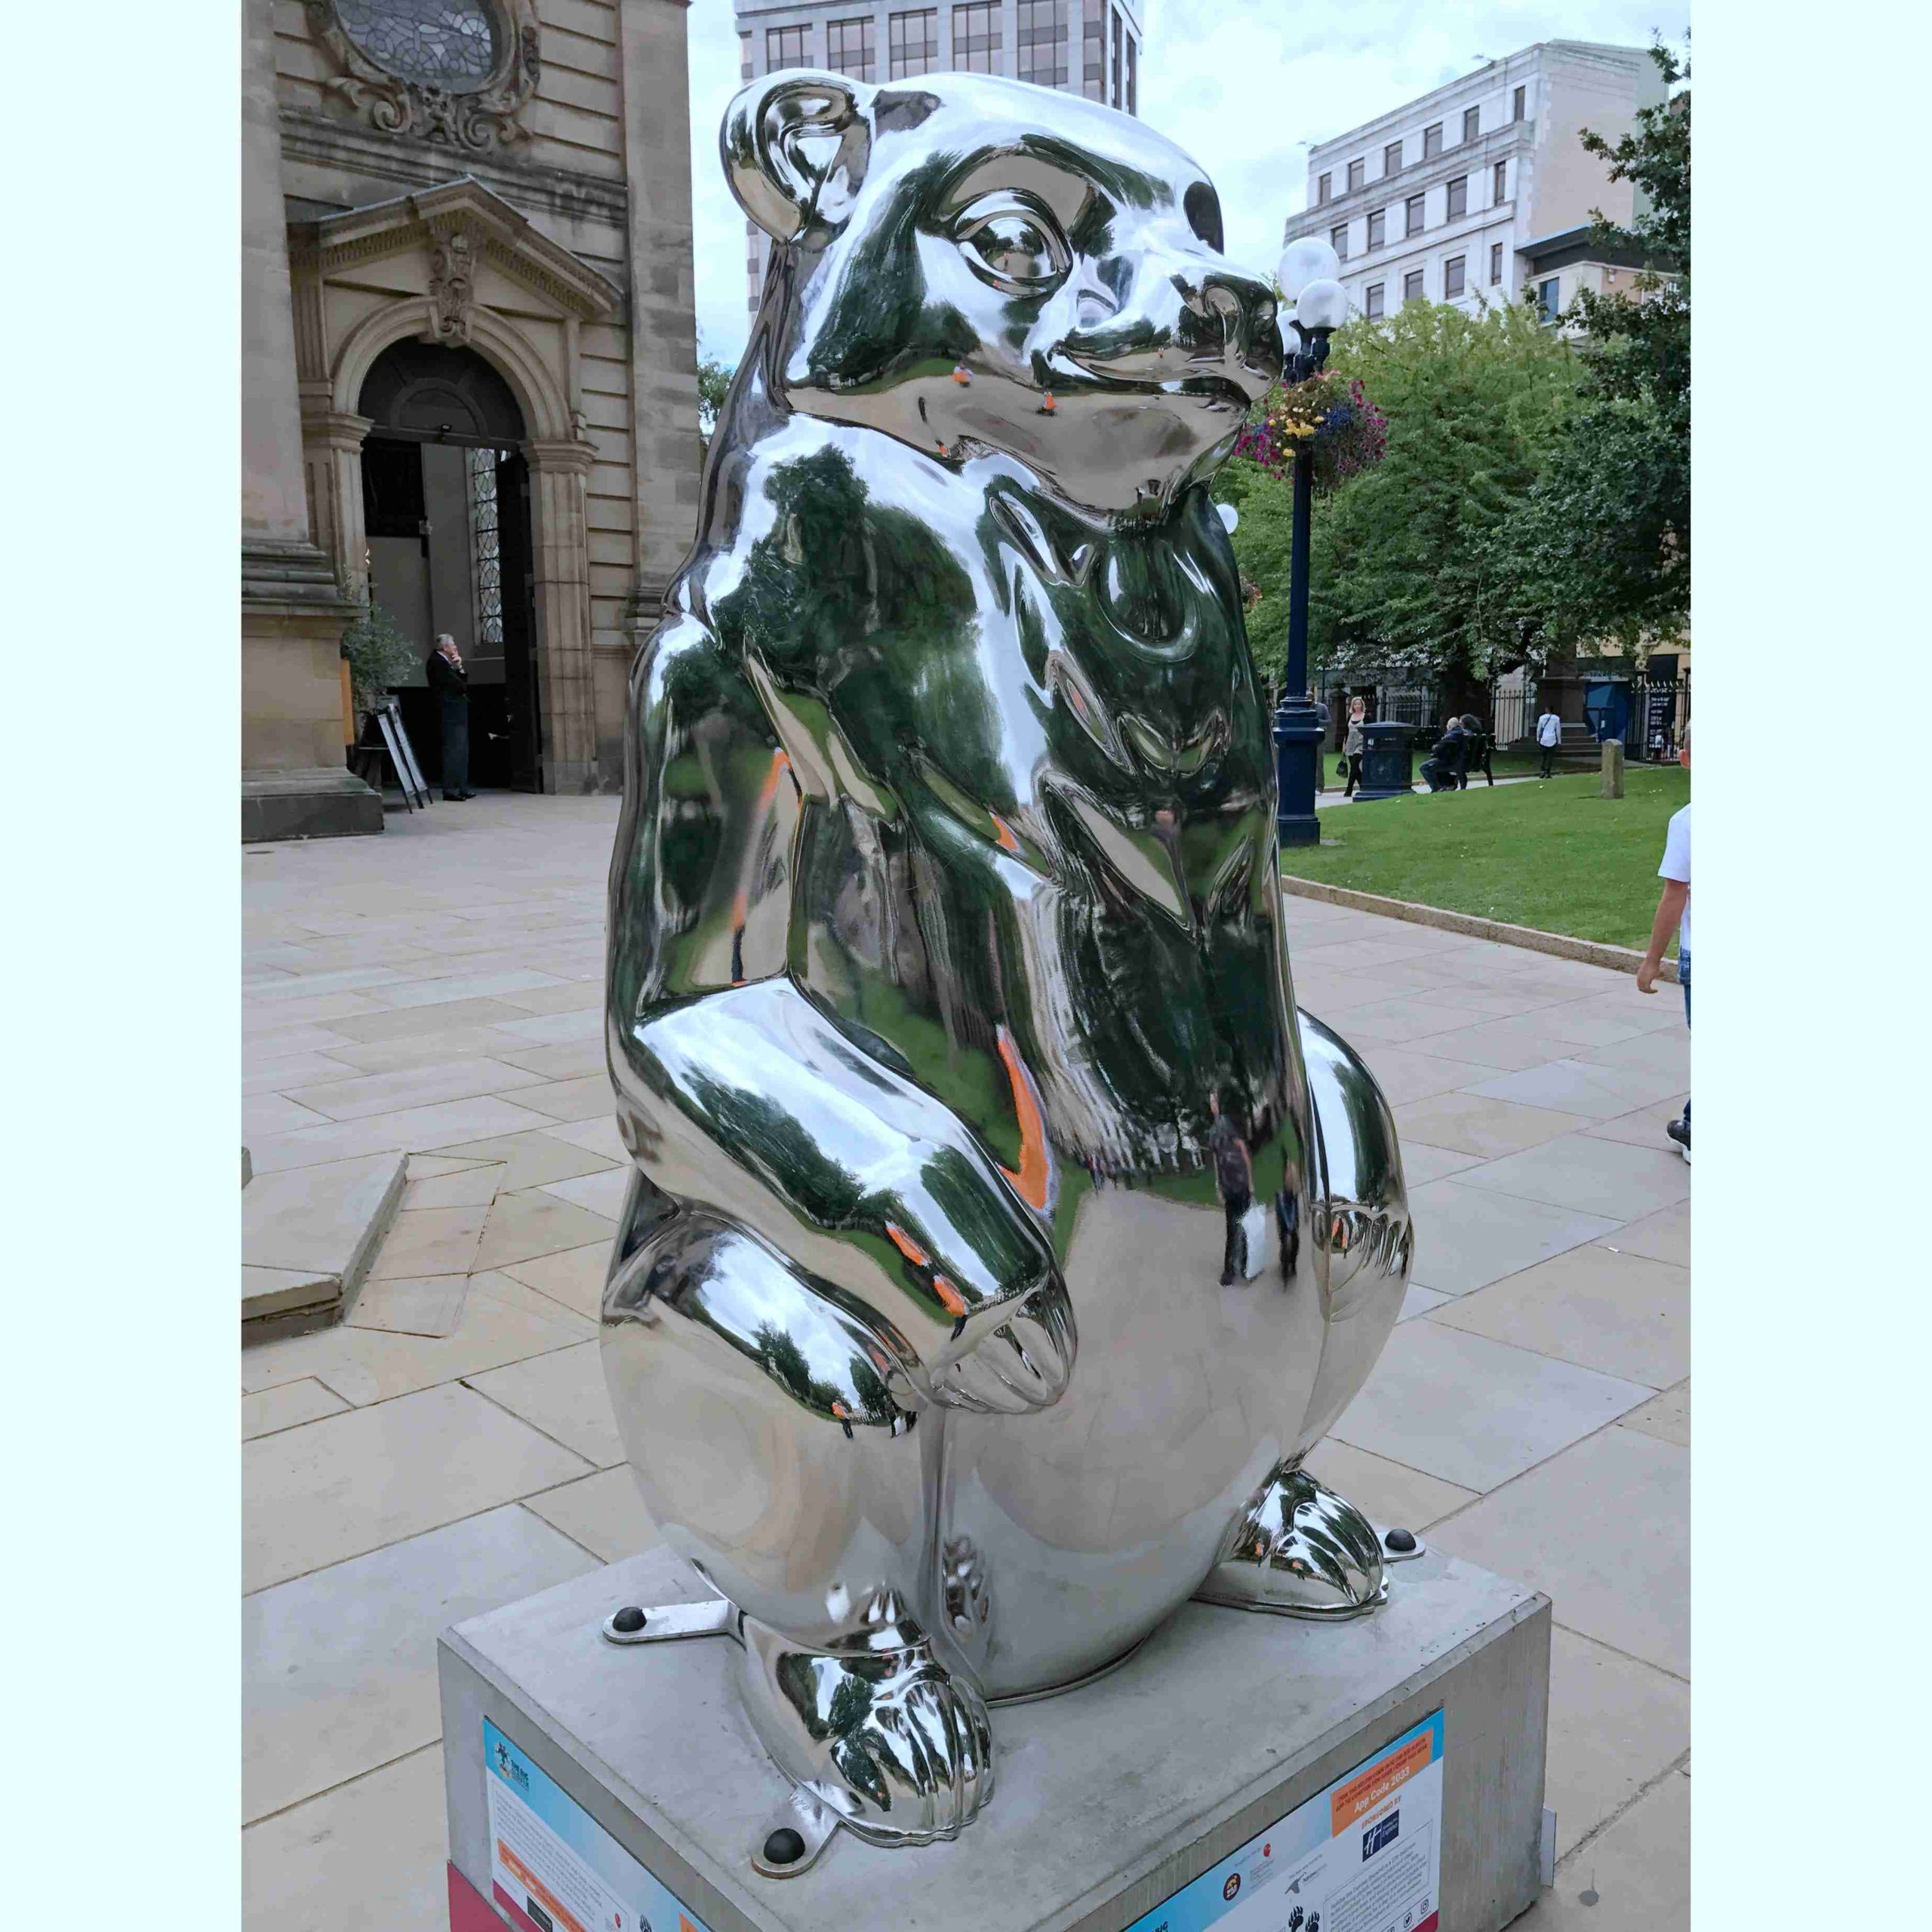 mirror polished bear sculpture